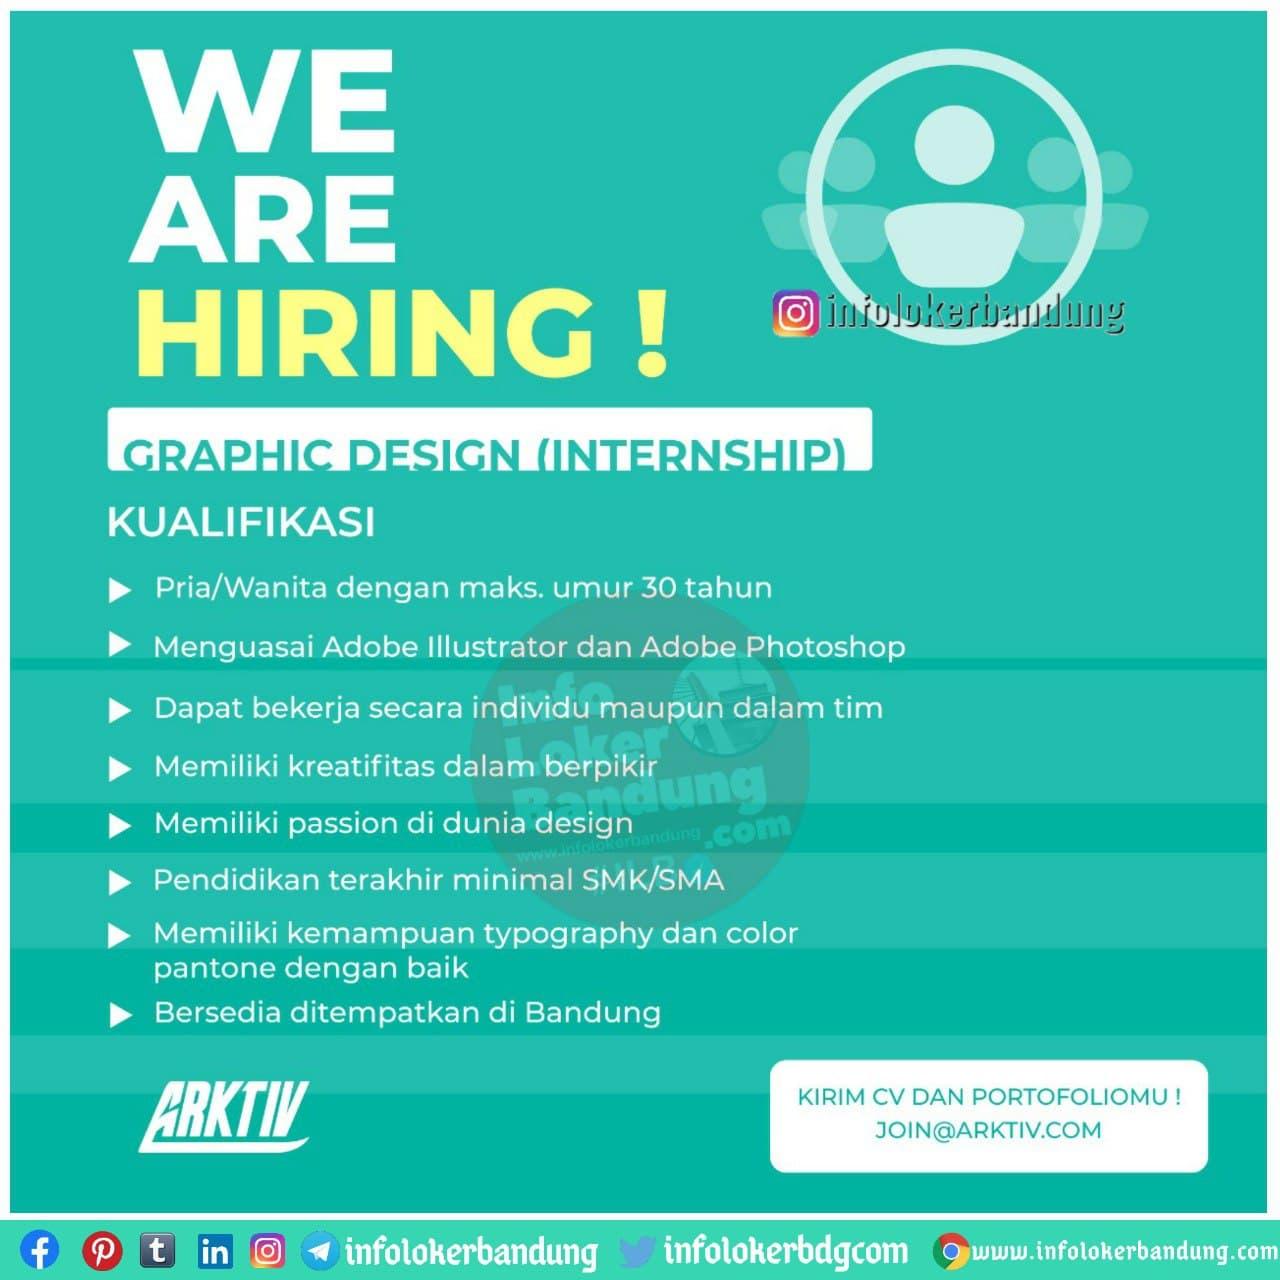 Lowongan Kerja Graphic Design (Internship) Arktiv Bandung Januari 2021